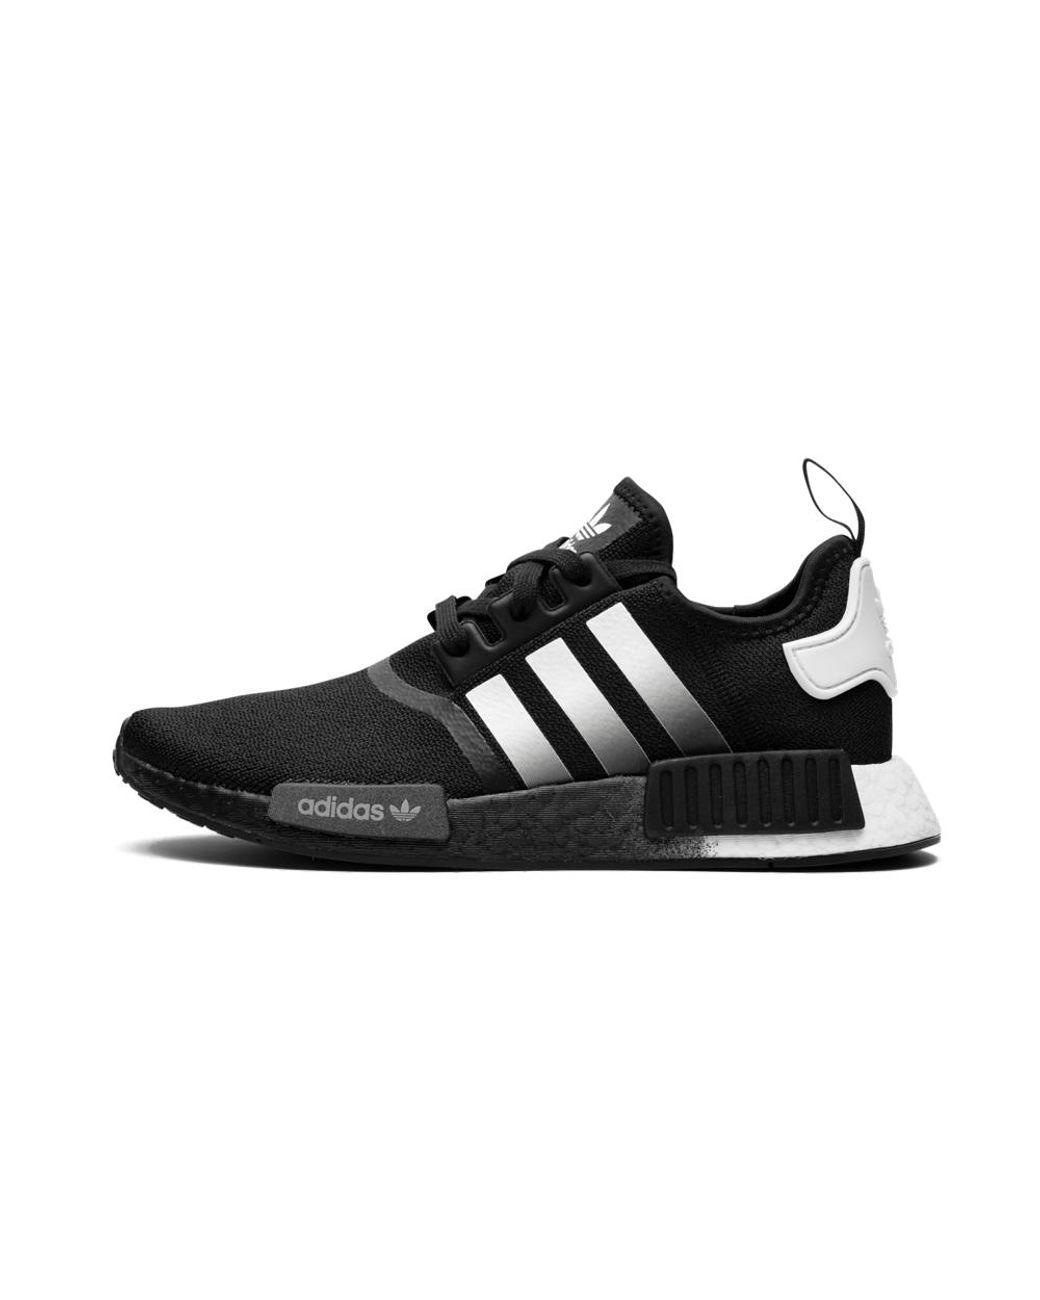 nmd adidas white and black